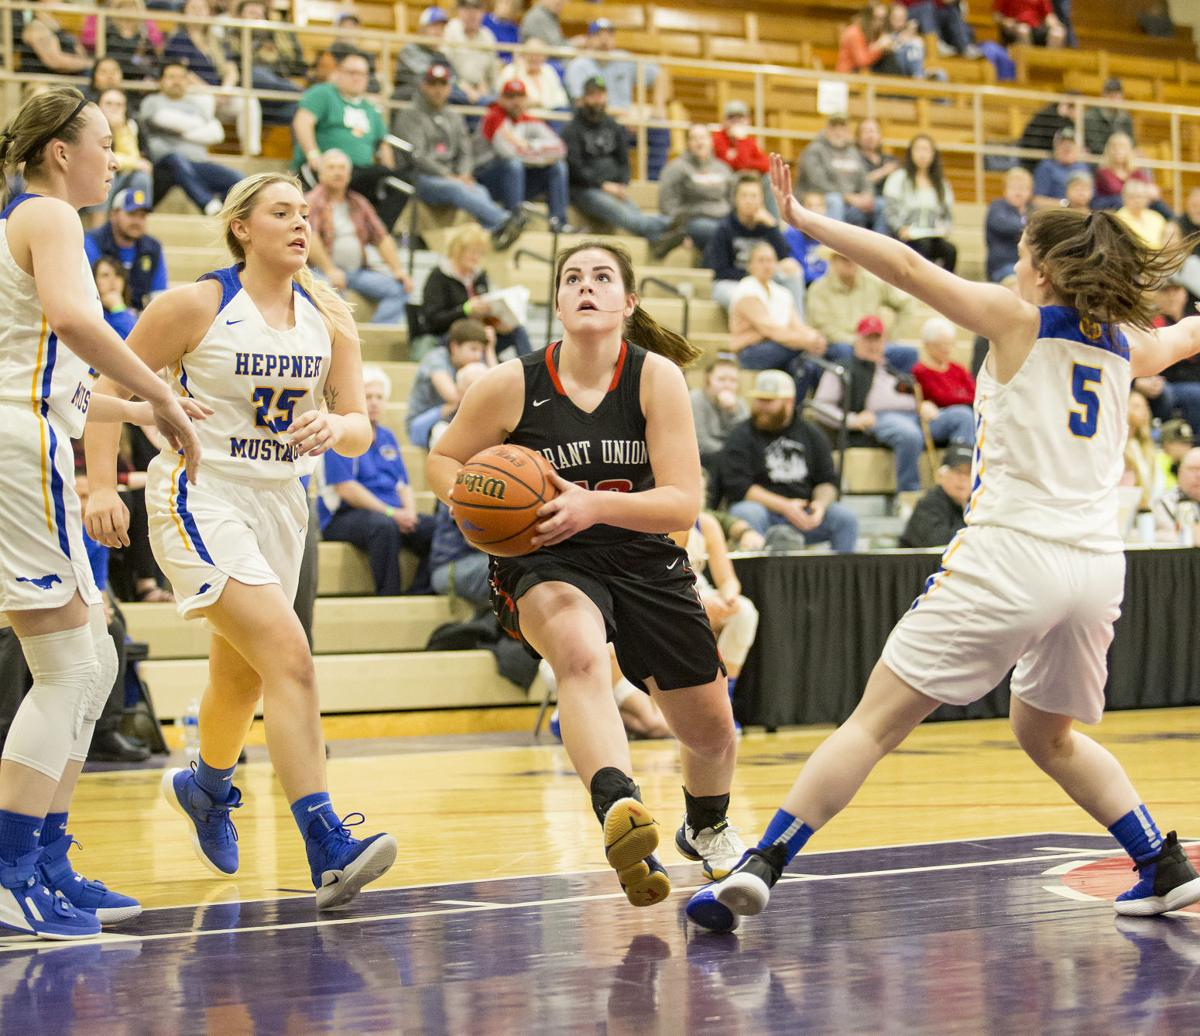 BMC Basketball Tournament | Heppner v Grant Union